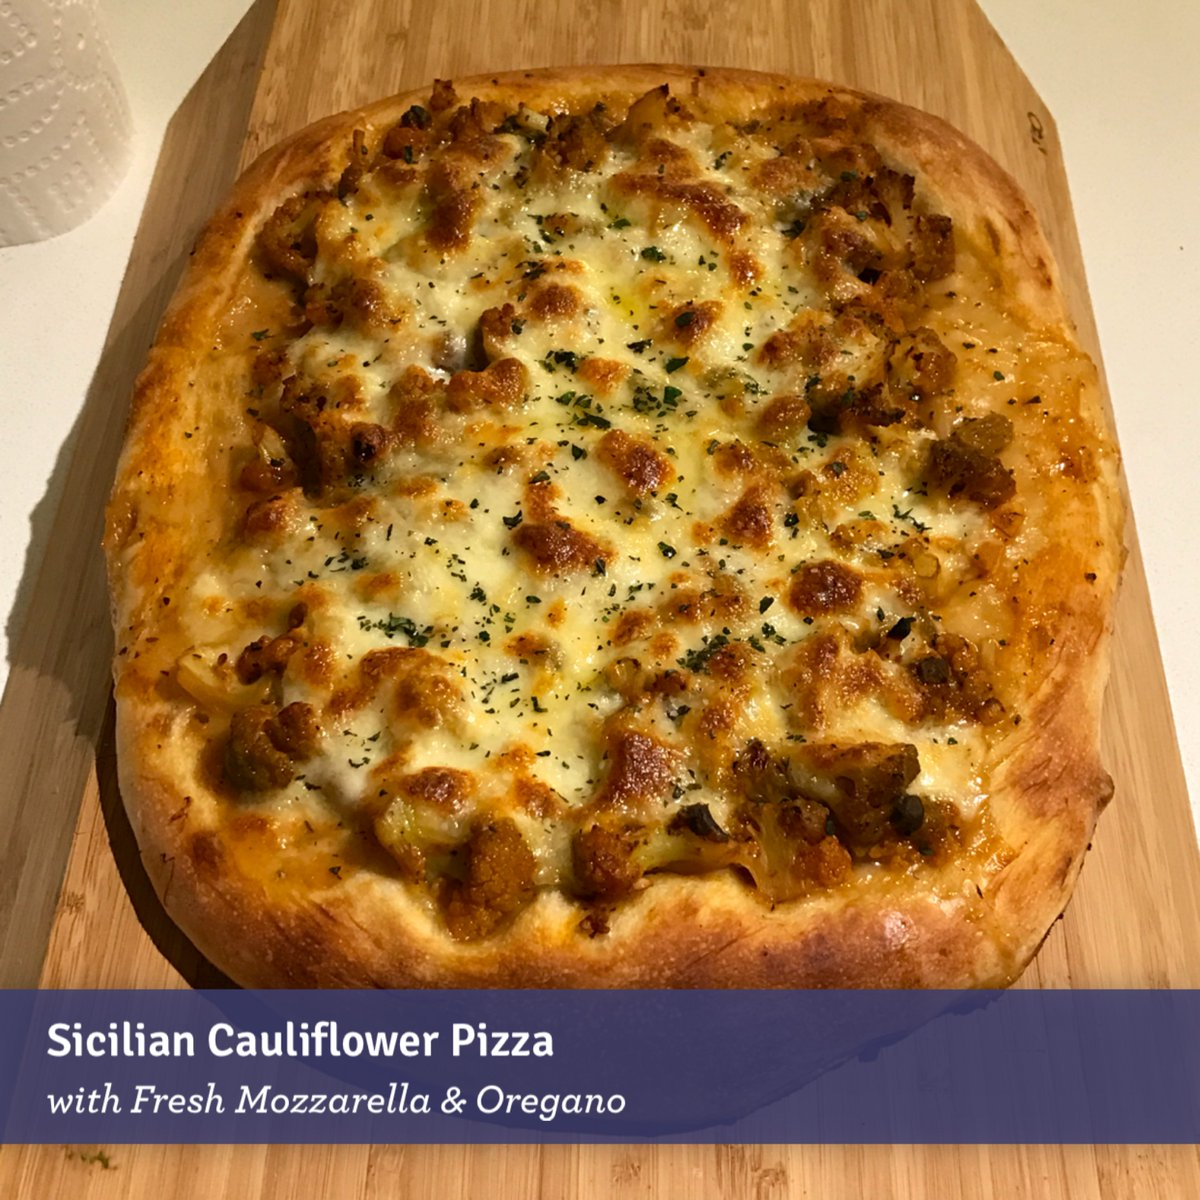 Blue apron cauliflower pizza - Patrick On Twitter Sicilian Cauliflower Pizza With Fresh Mozzarella Oregano Blueapron Https T Co Jxfurvnqhu